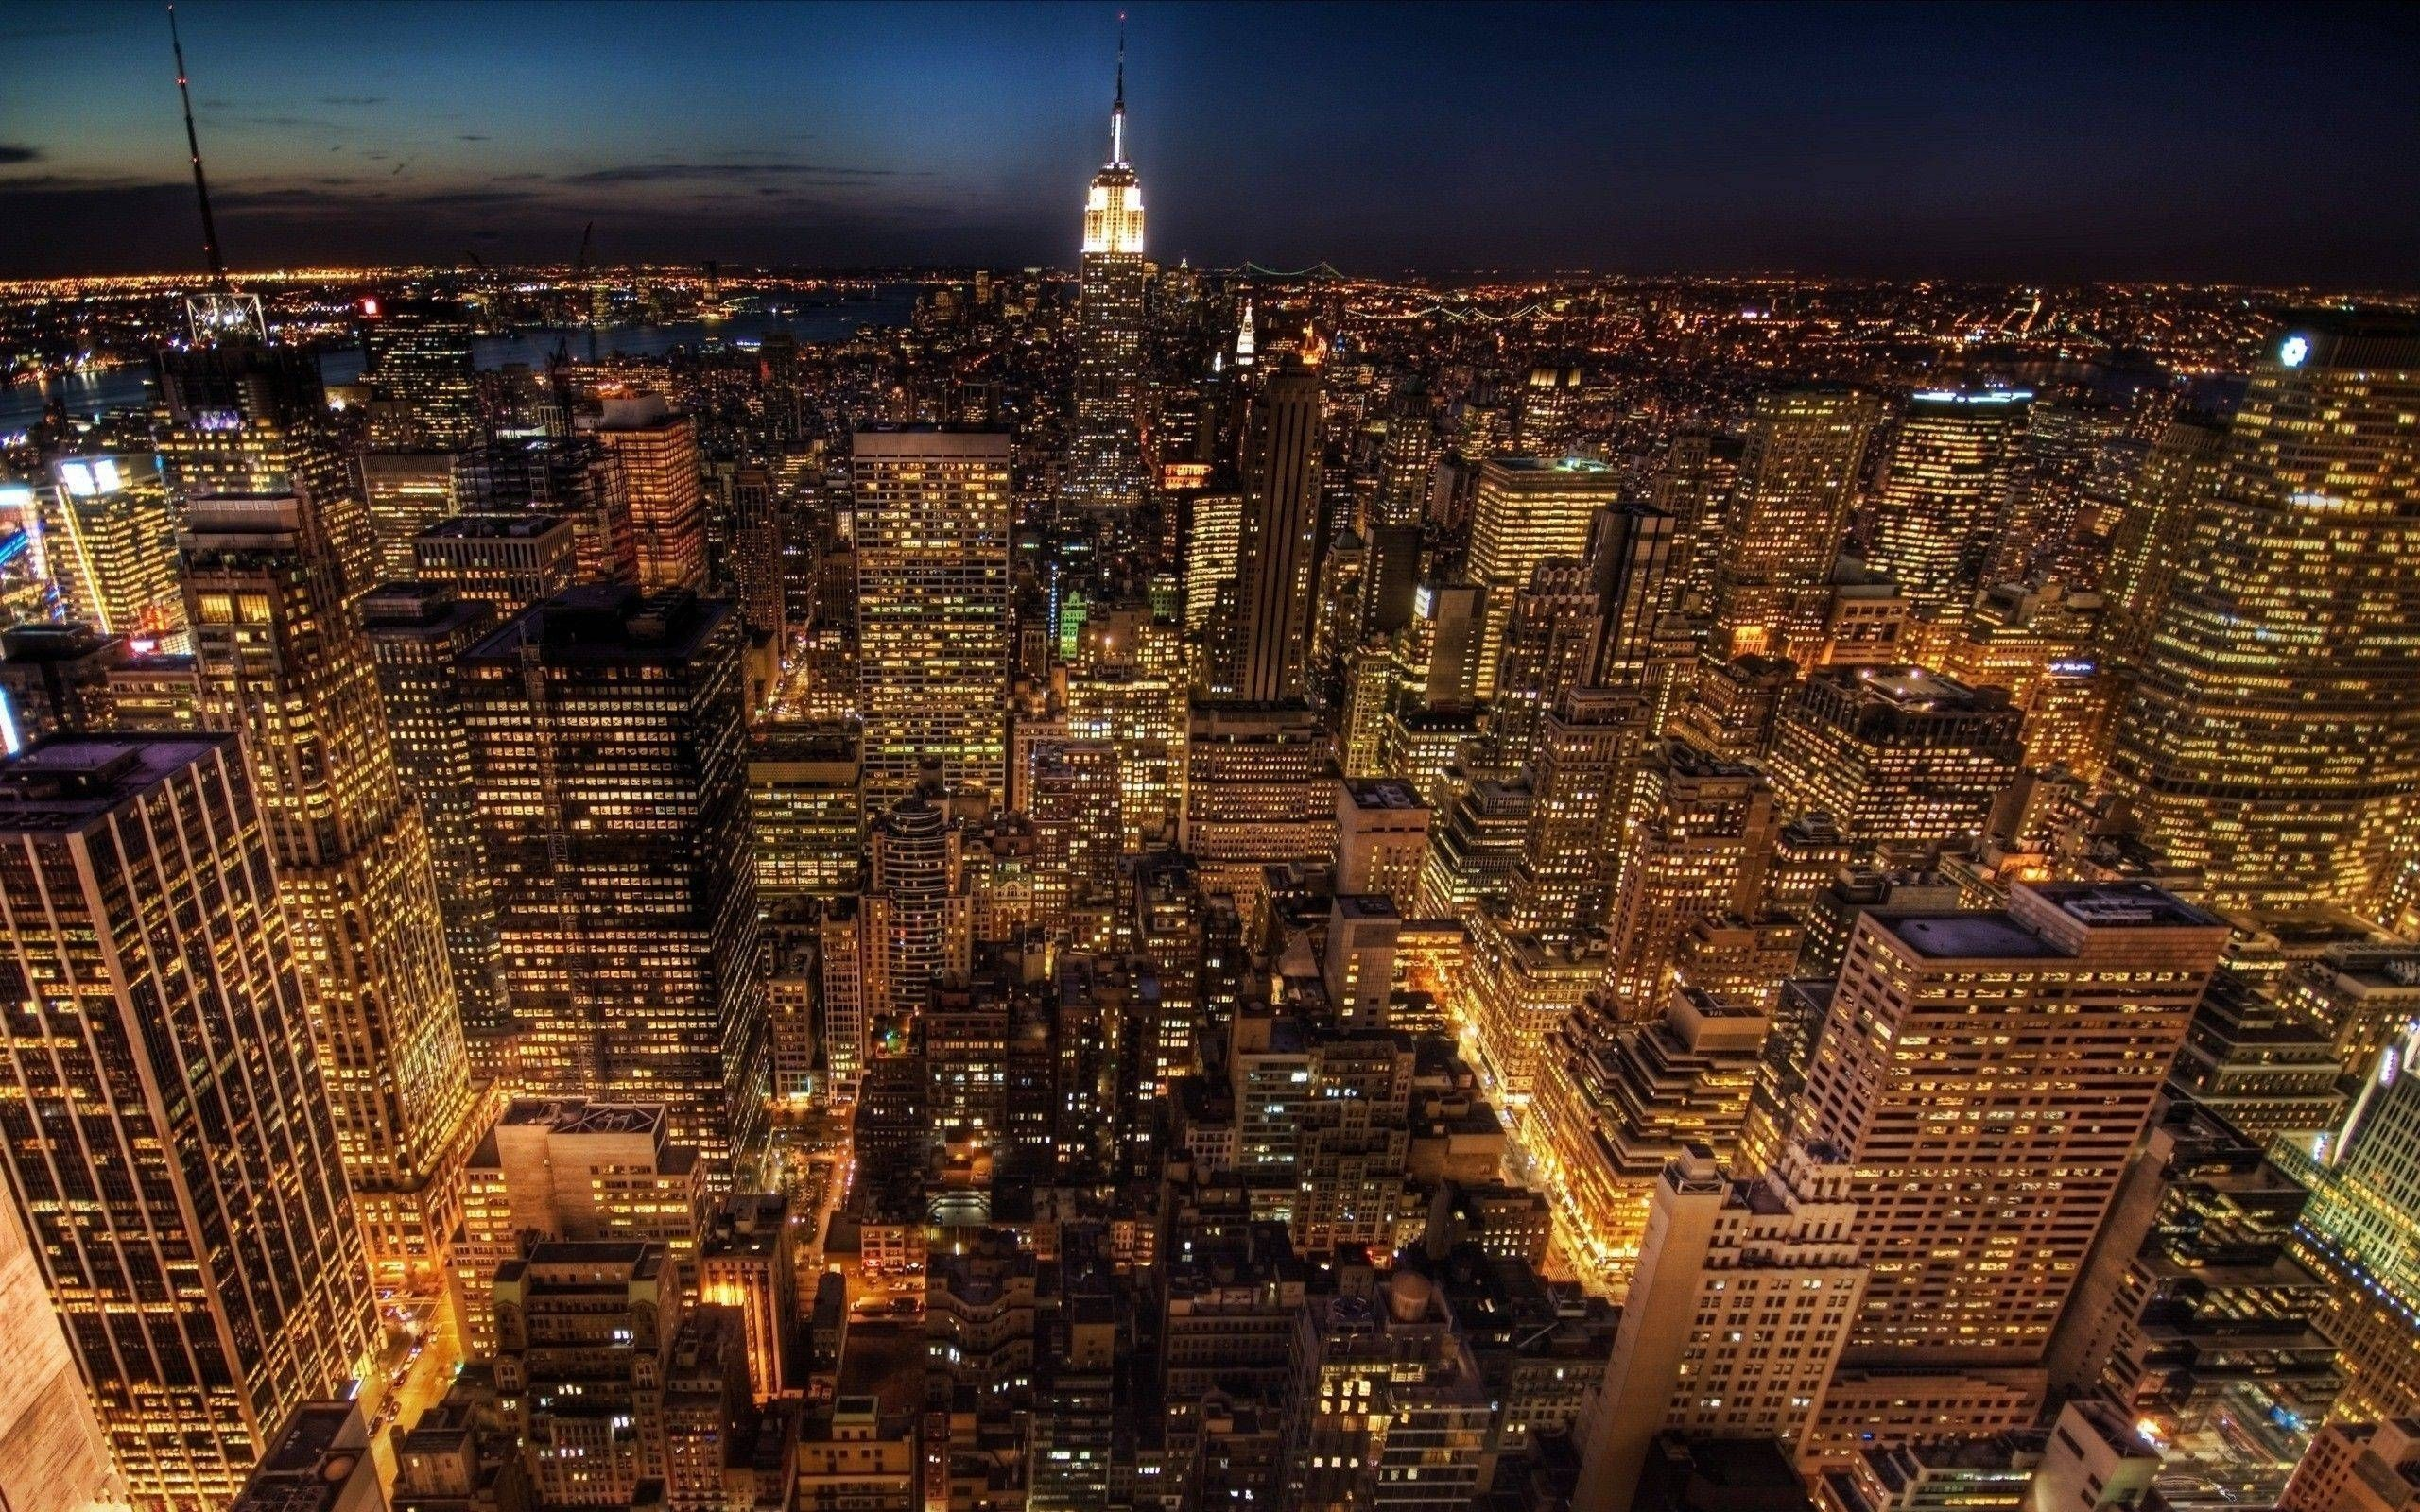 10 Best New York City Night Hd Wallpaper Full Hd 1080p - New York City At Night Hd - HD Wallpaper